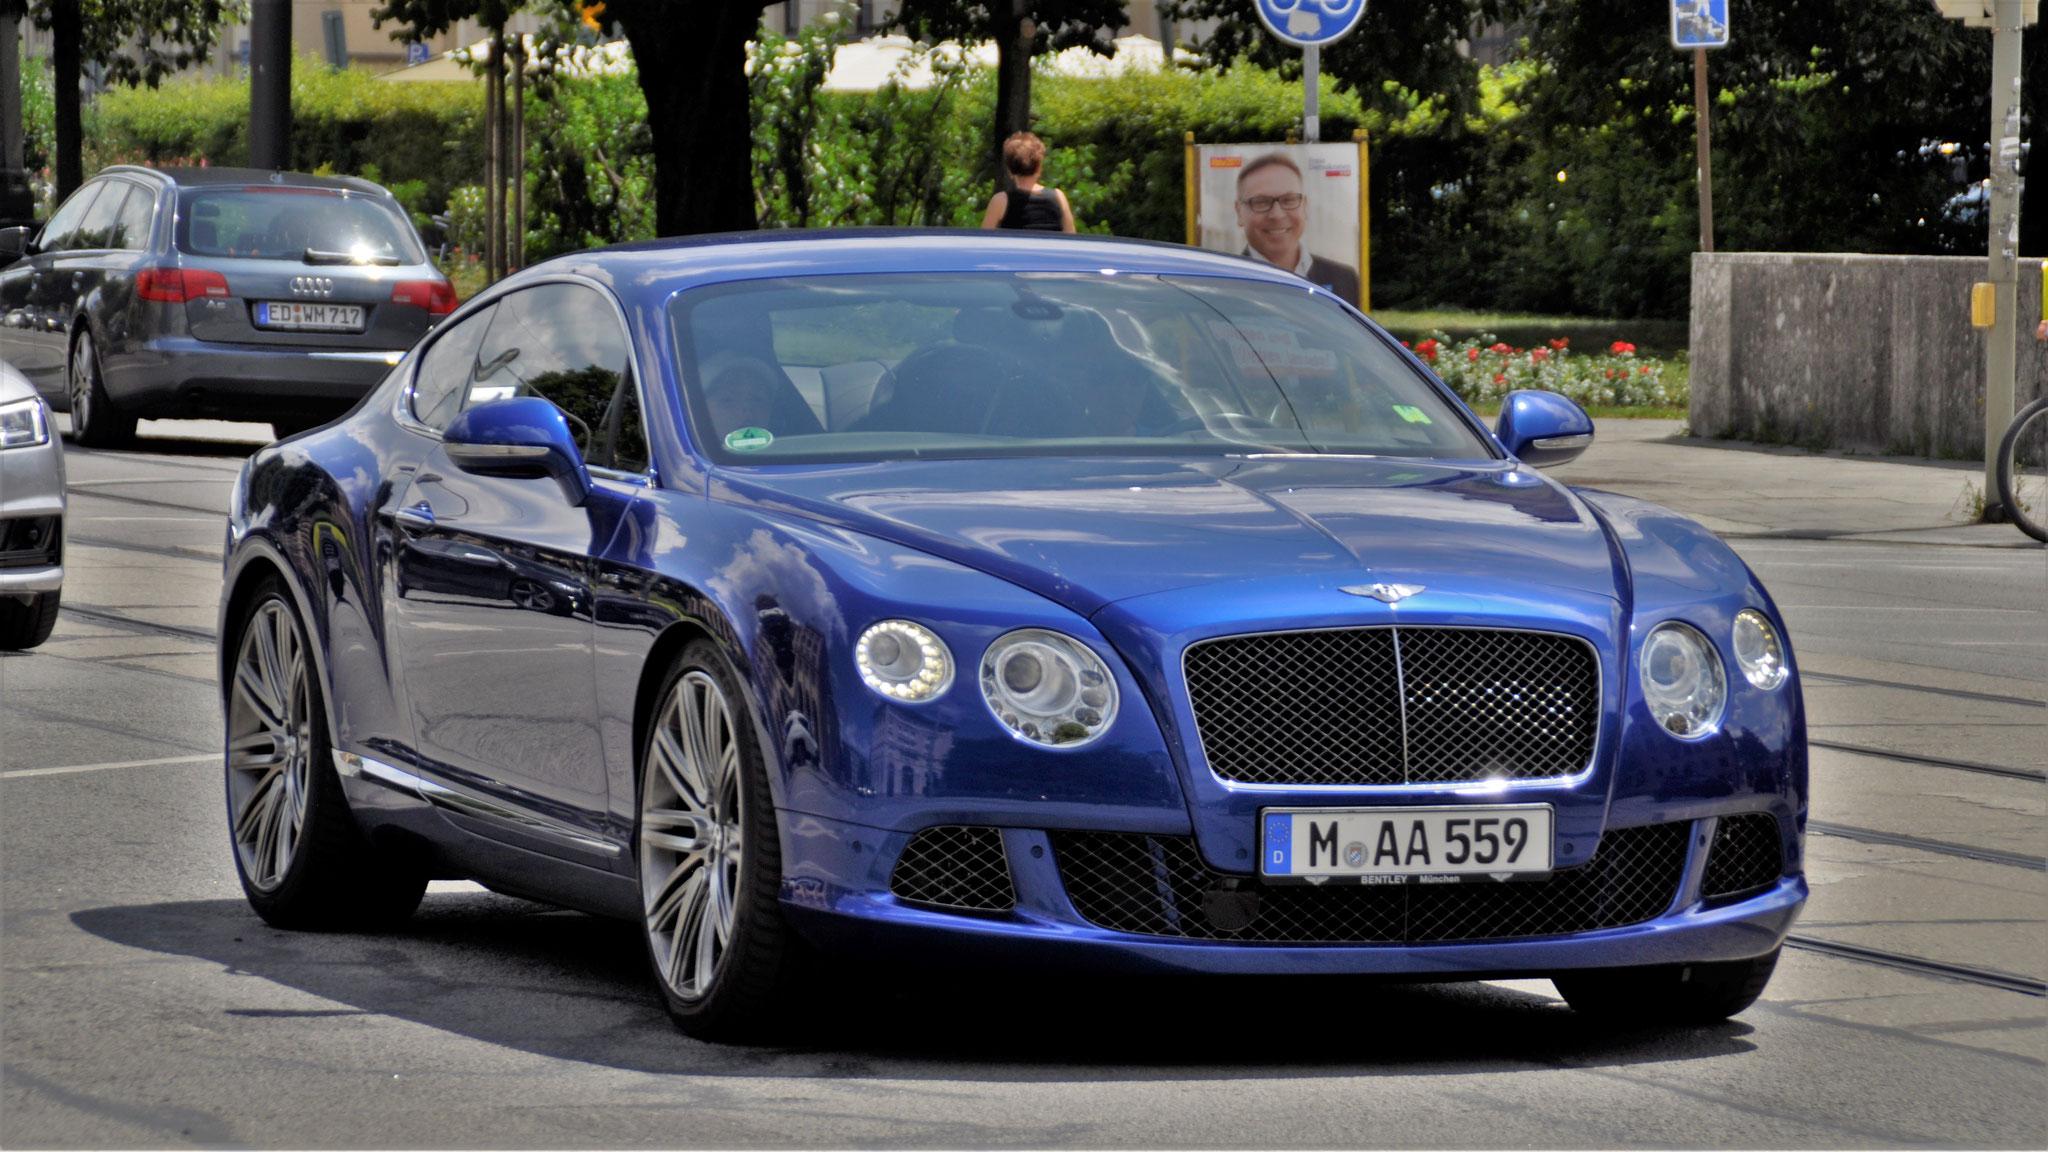 Bentley Continental GT W12 - M-AA-559